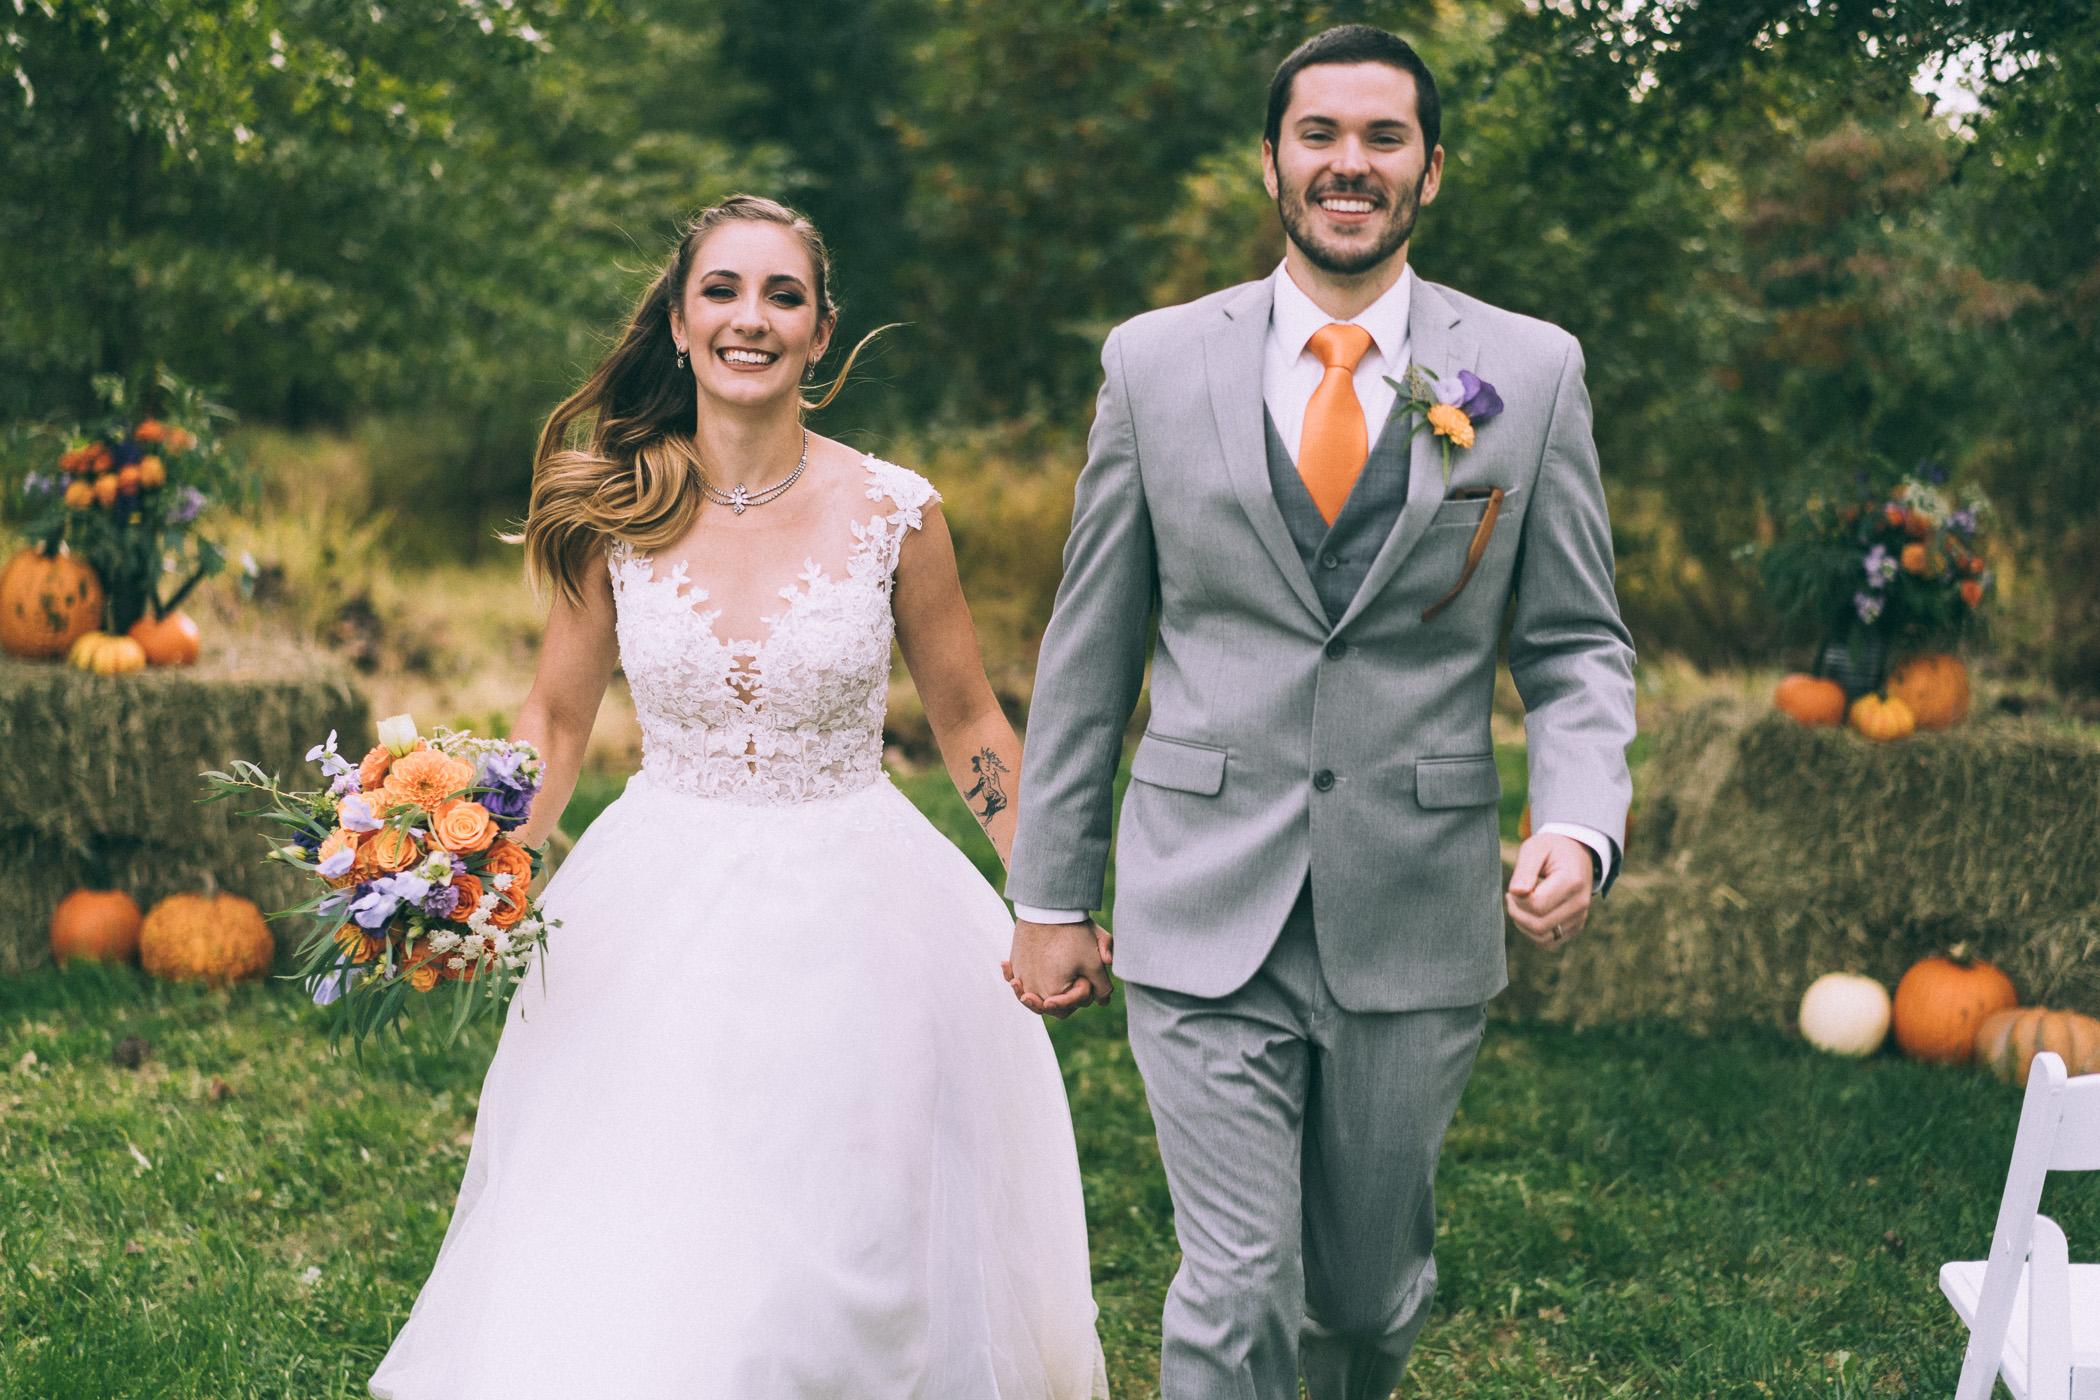 18-Faux Wedding-brandon shane warren-283.jpg